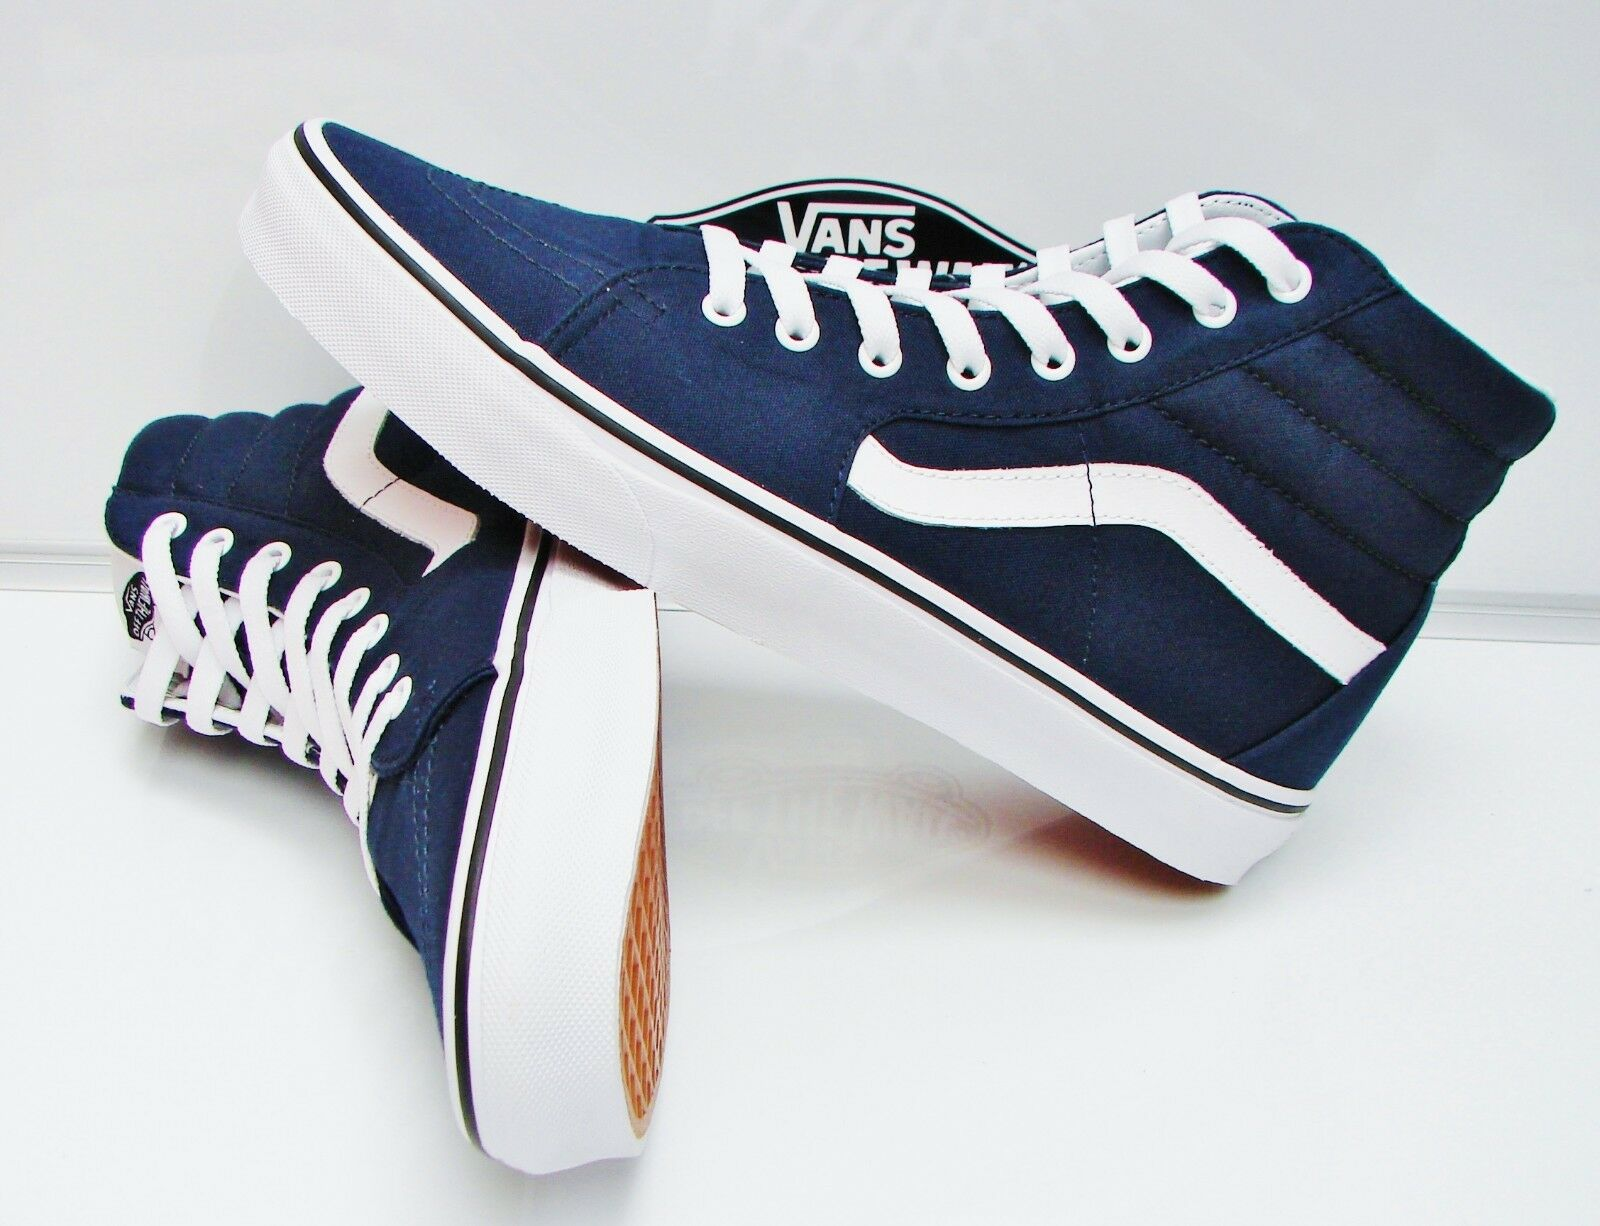 SK8-HI (CANVAS)DRESS blueES TRUE WHITE VN-000TS9KO7 MEN'S SIZE  10